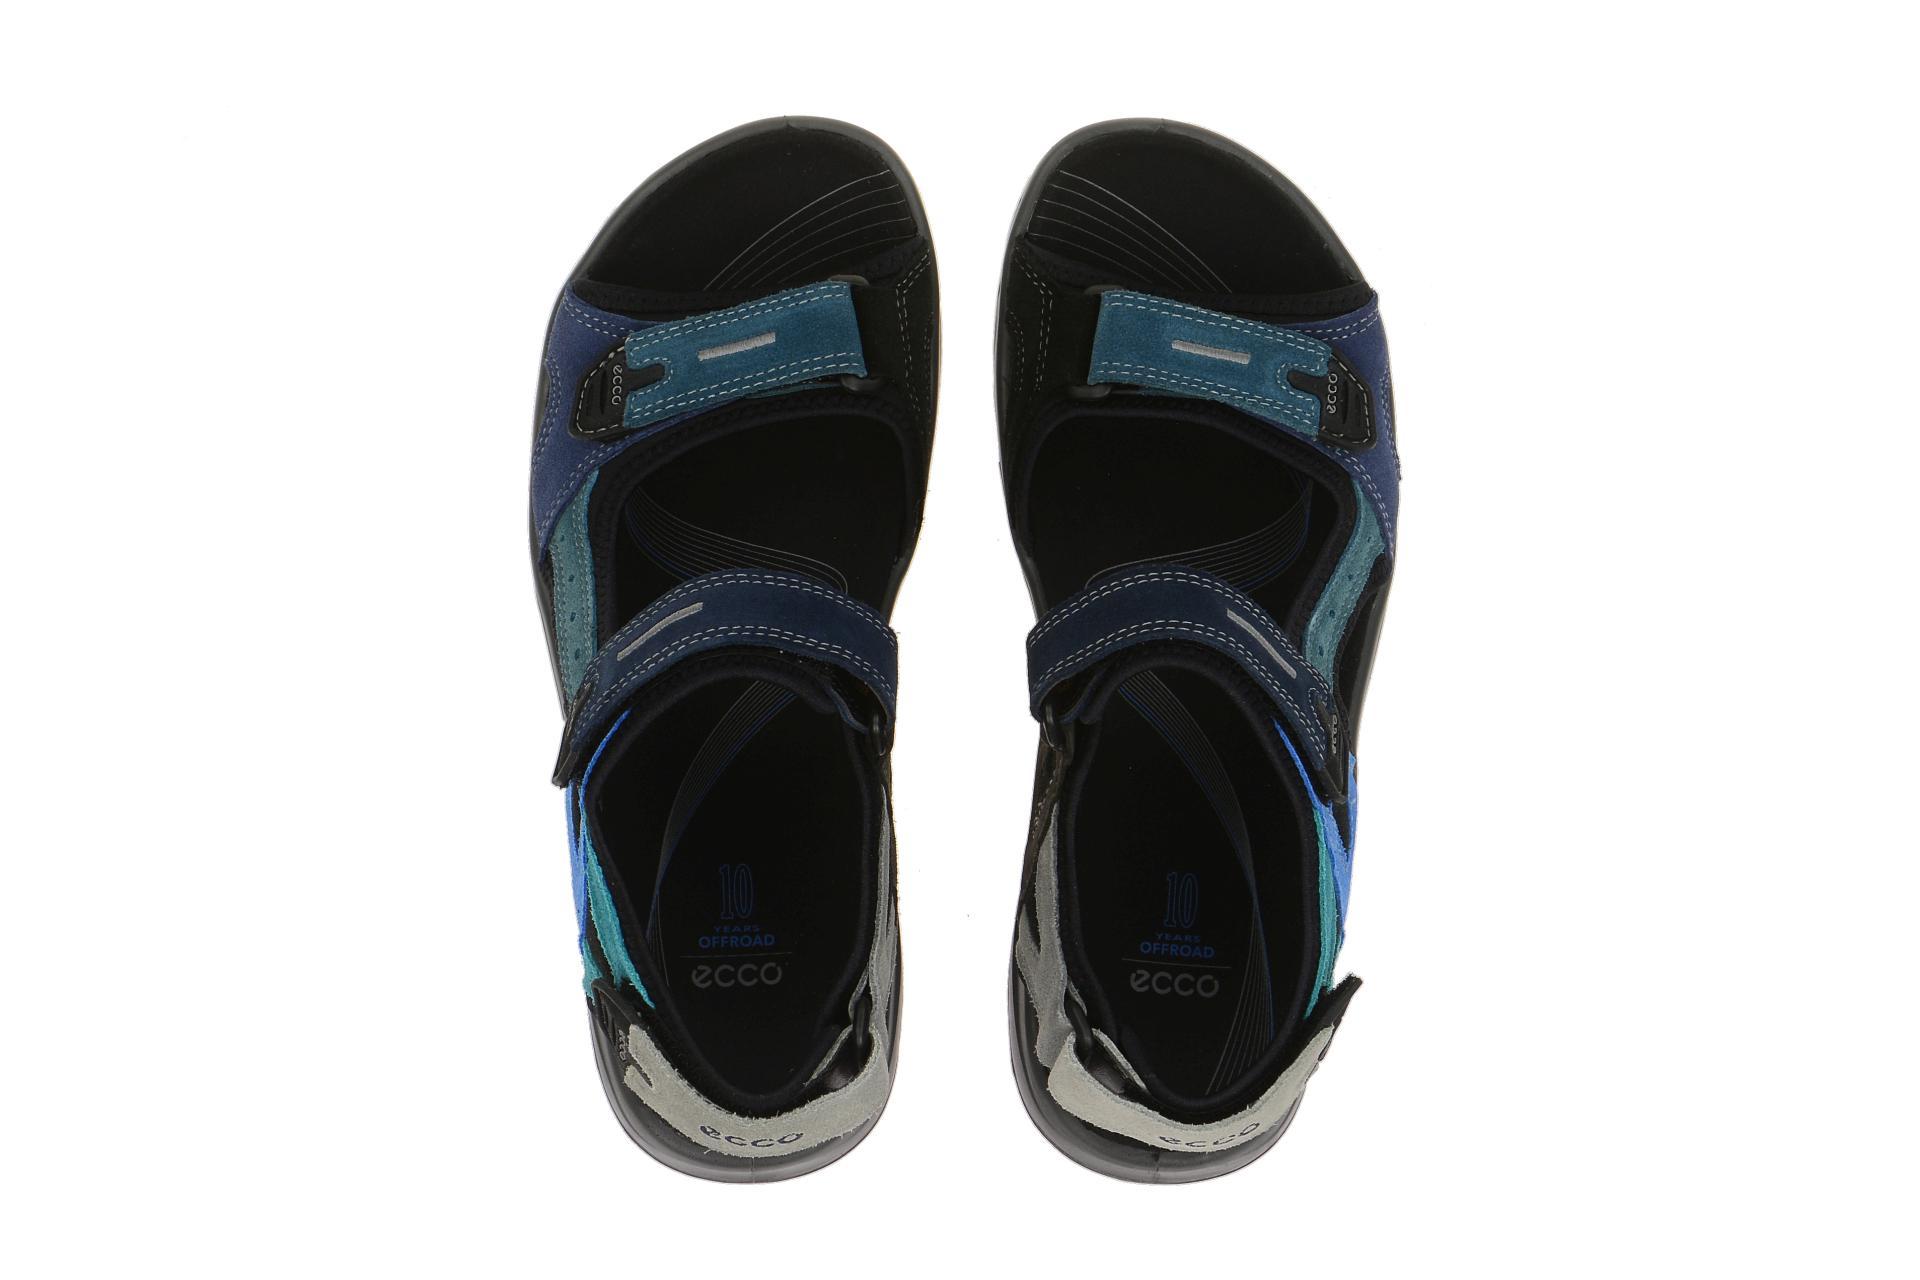 ecco offroad sandale blau multi gr 48 schuhhaus strauch shop. Black Bedroom Furniture Sets. Home Design Ideas